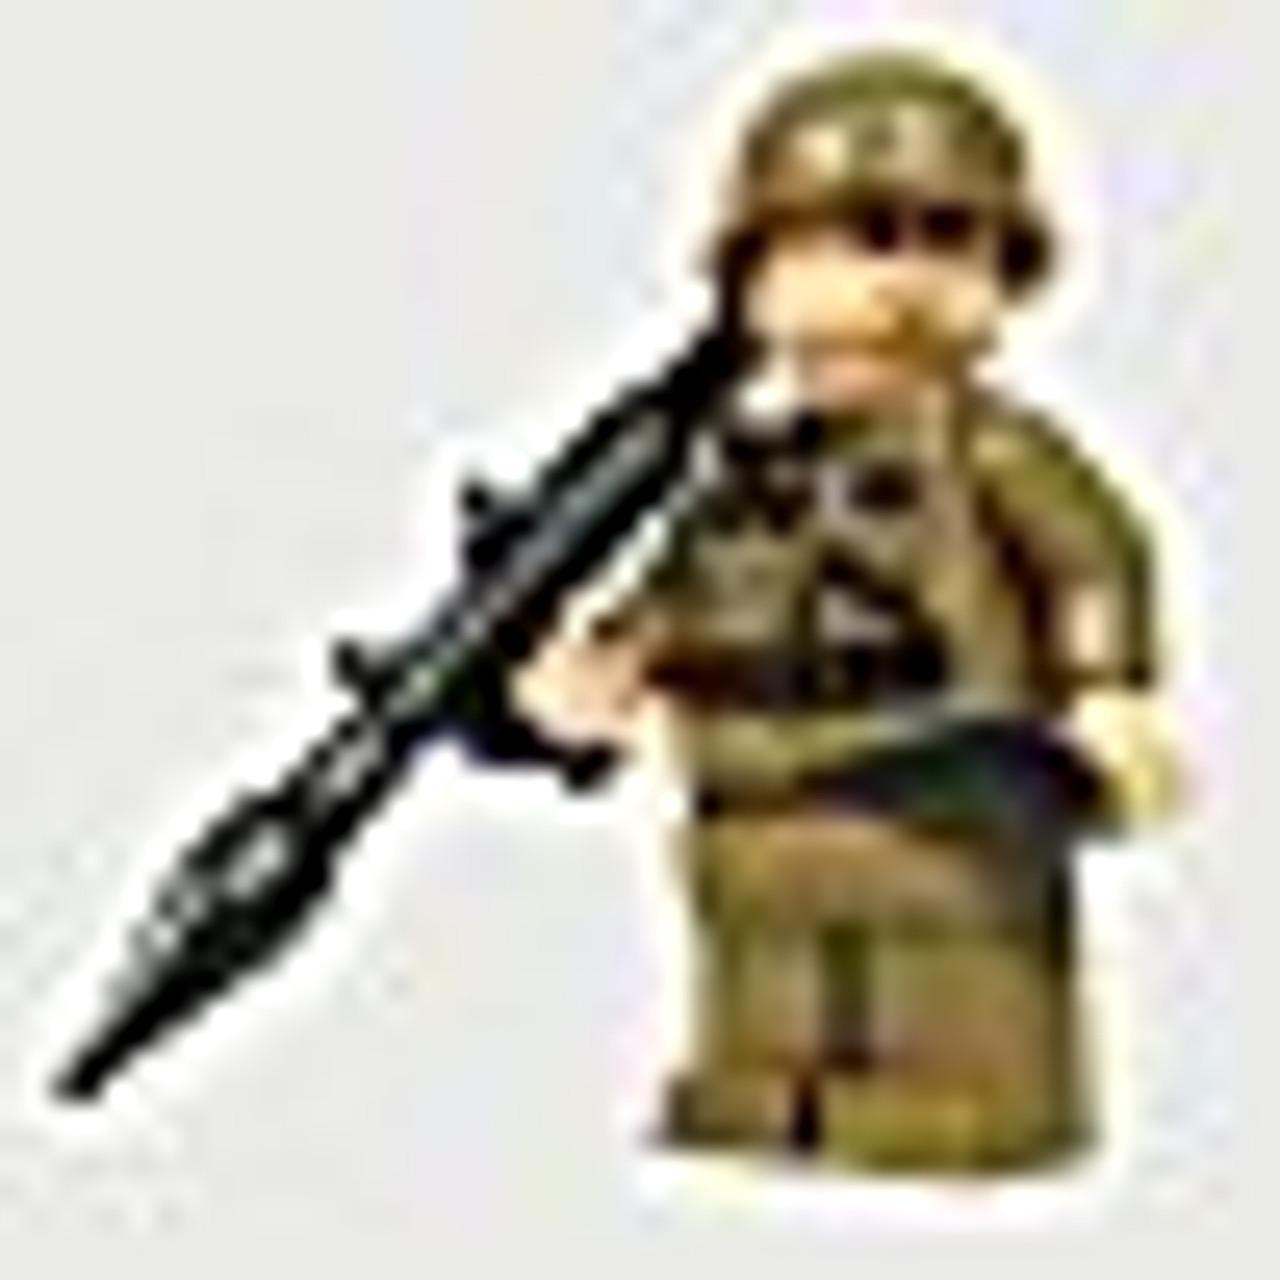 BrickArms RPG-7 Rocket Grenade